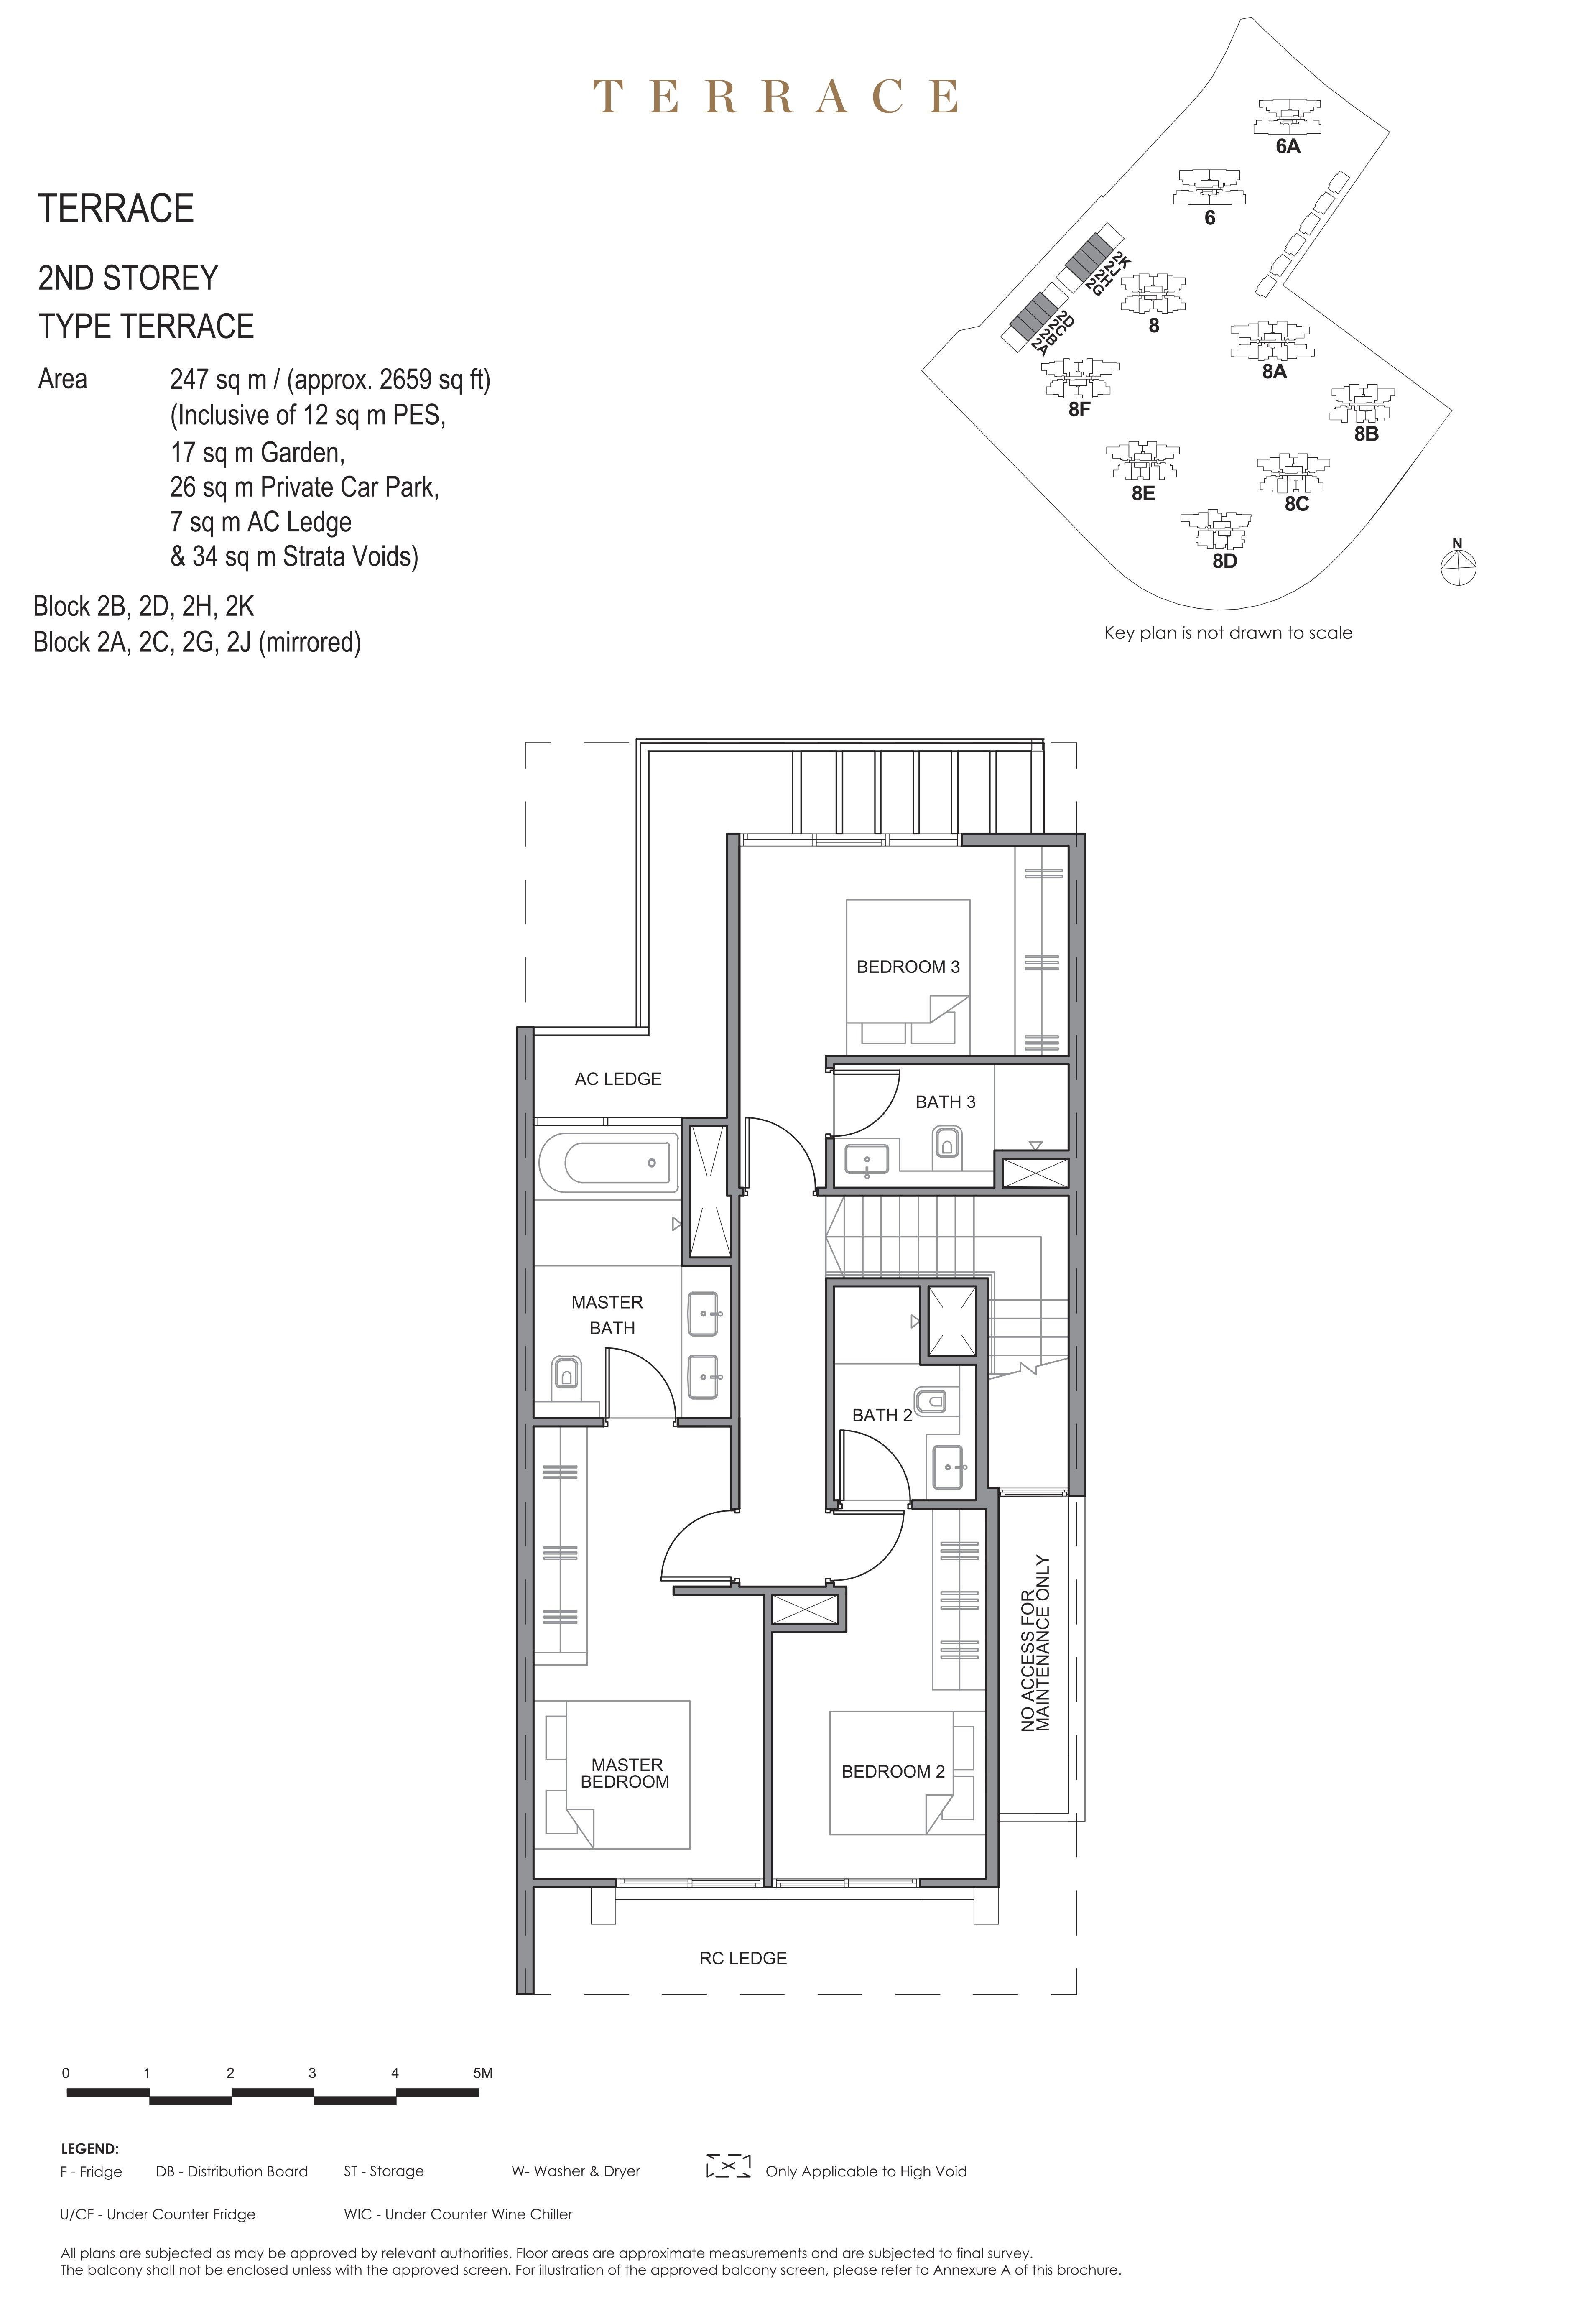 Parc Clematis 锦泰门第 masterpiece Intermediate Terrace 2nd storey